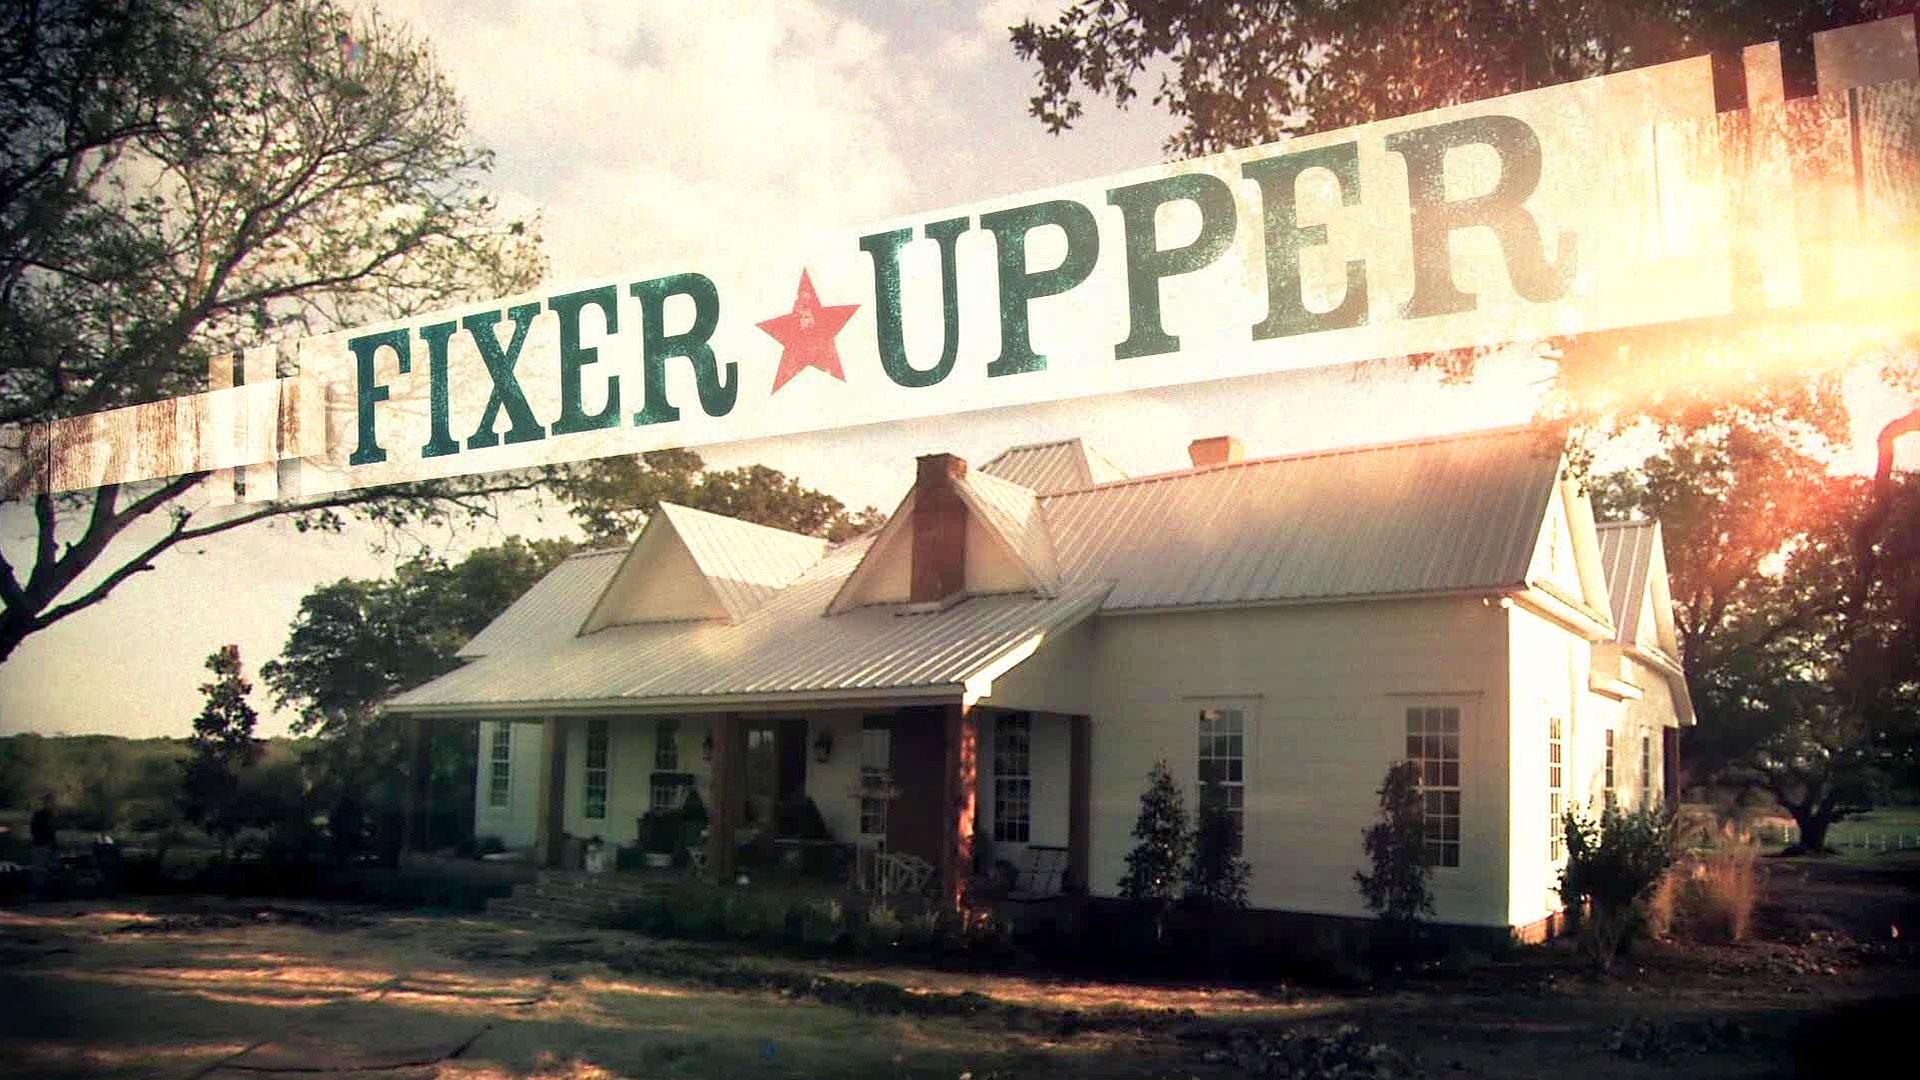 How to buy a fixer upper - How To Buy A Fixer Upper 40